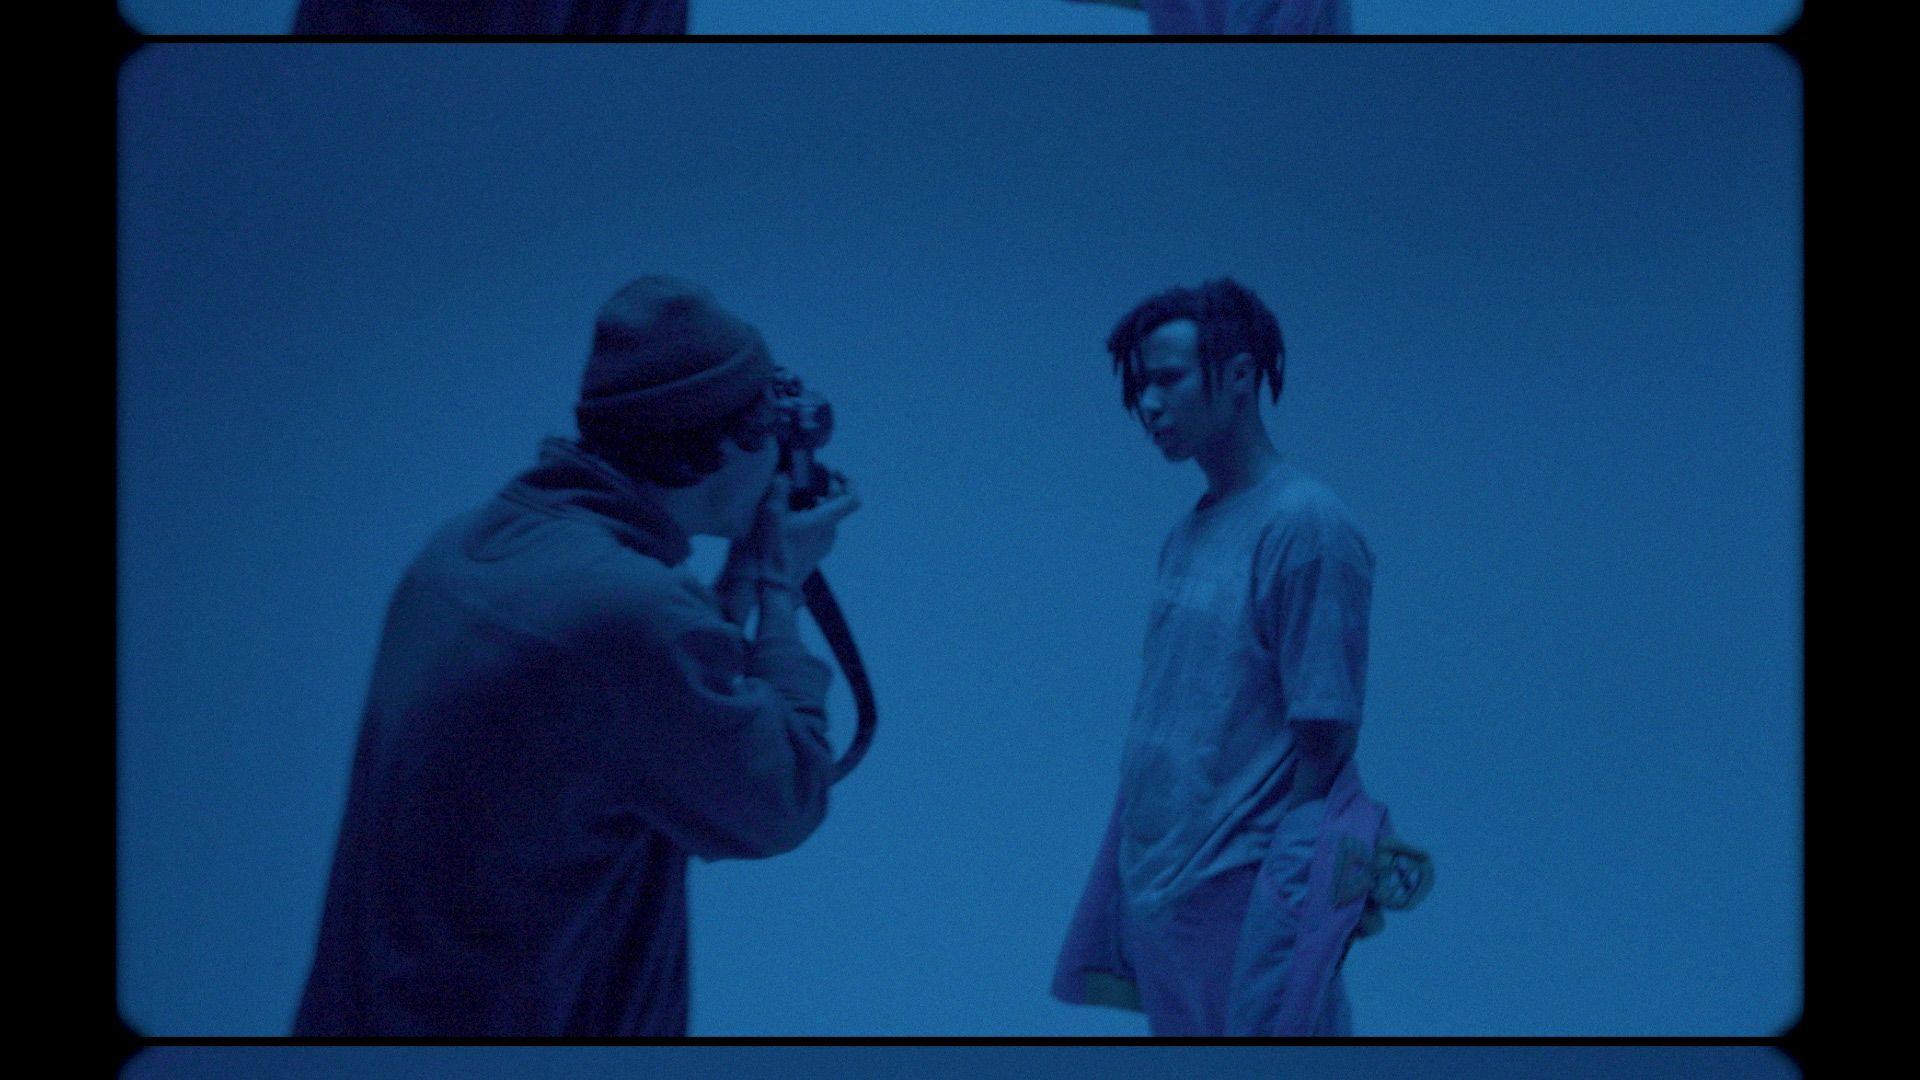 rapper Zach Zoya in blue lighting for music video Who Dat filmed by Les Gamins